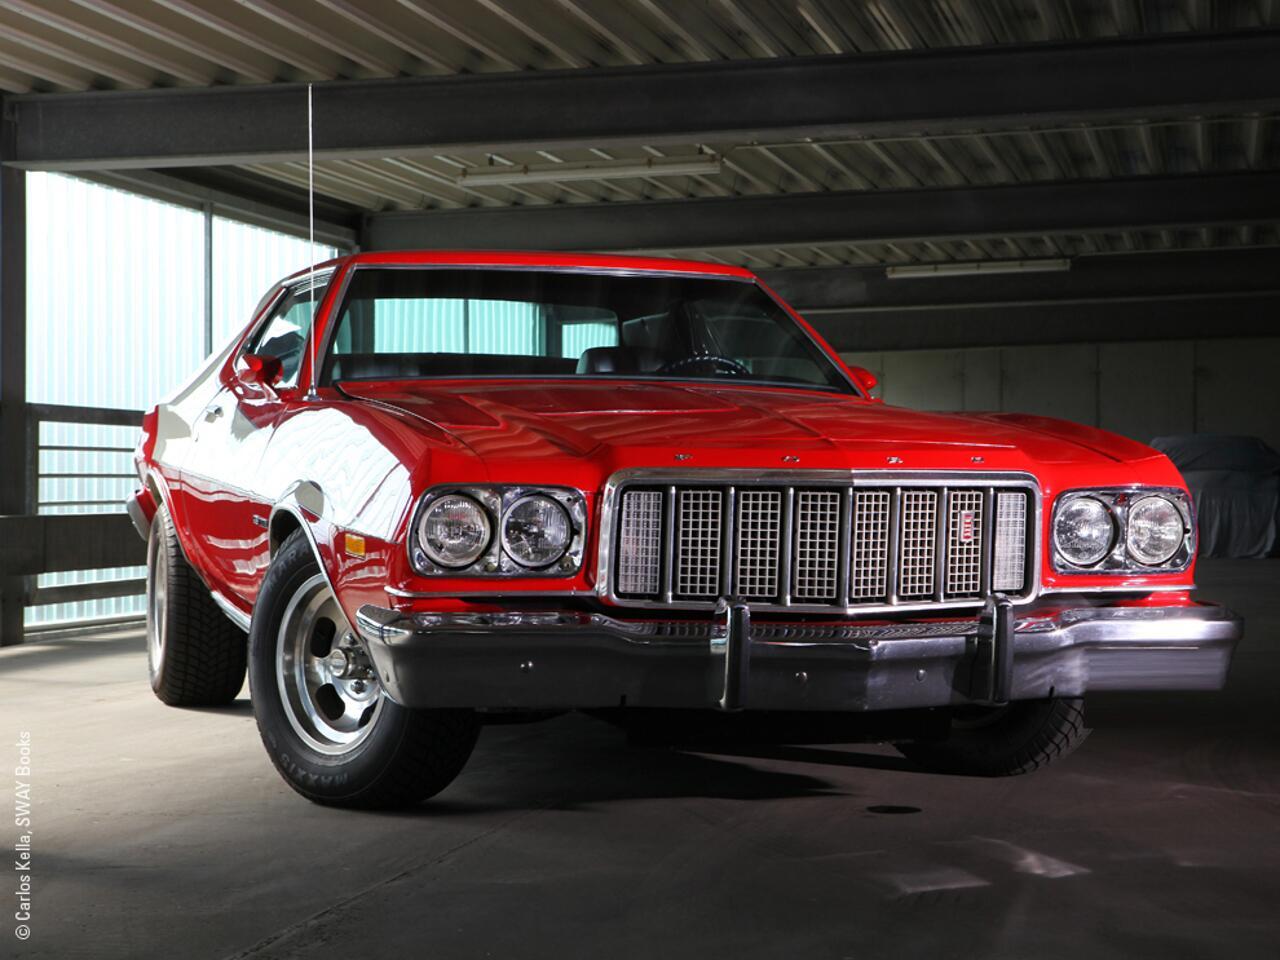 Bild zu 1974 Ford Torino